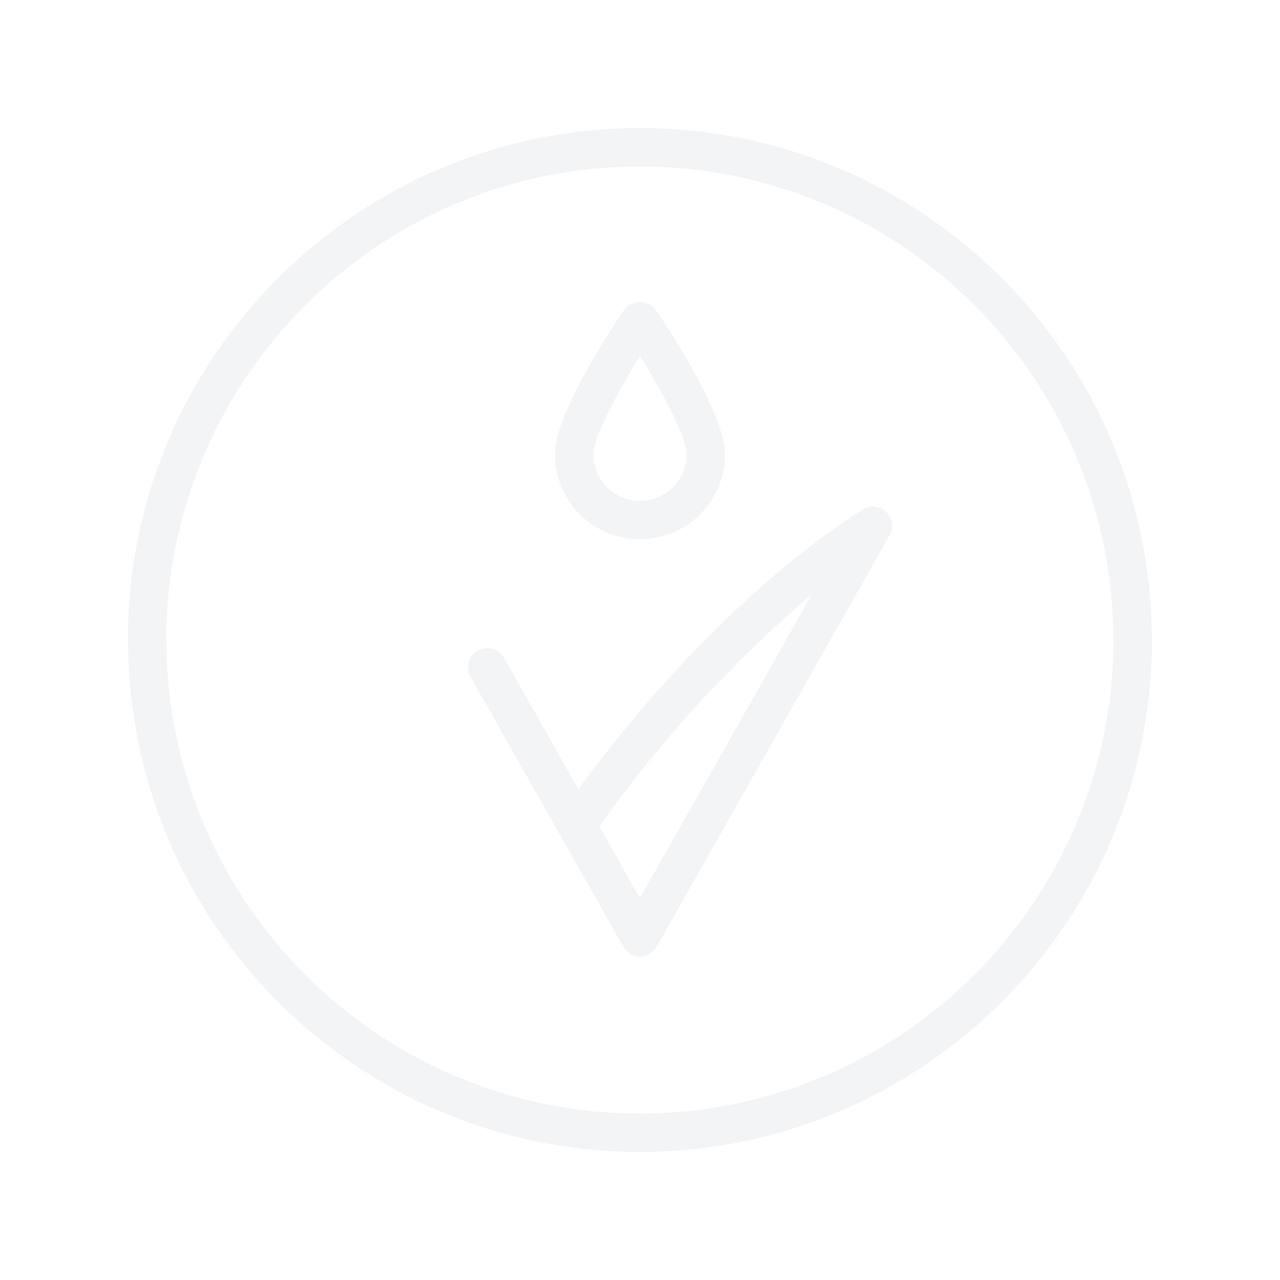 DOLCE & GABBANA Dolce Garden Eau De Parfum